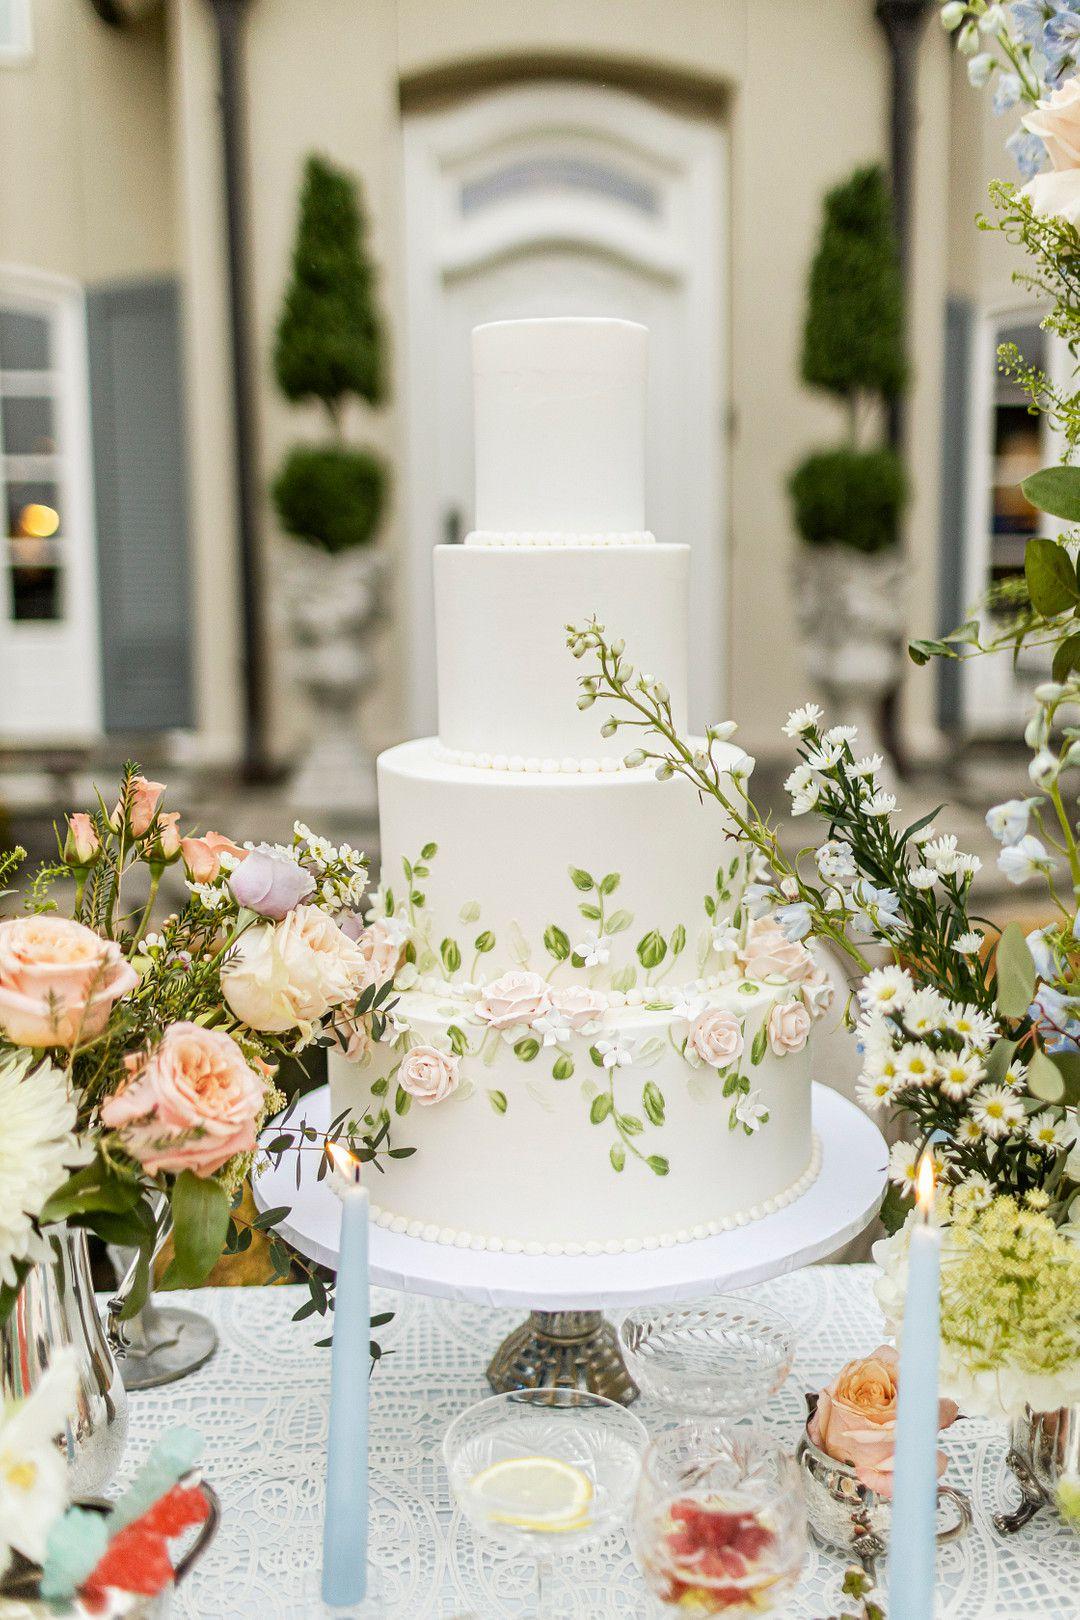 bridgerton netflix wedding cake